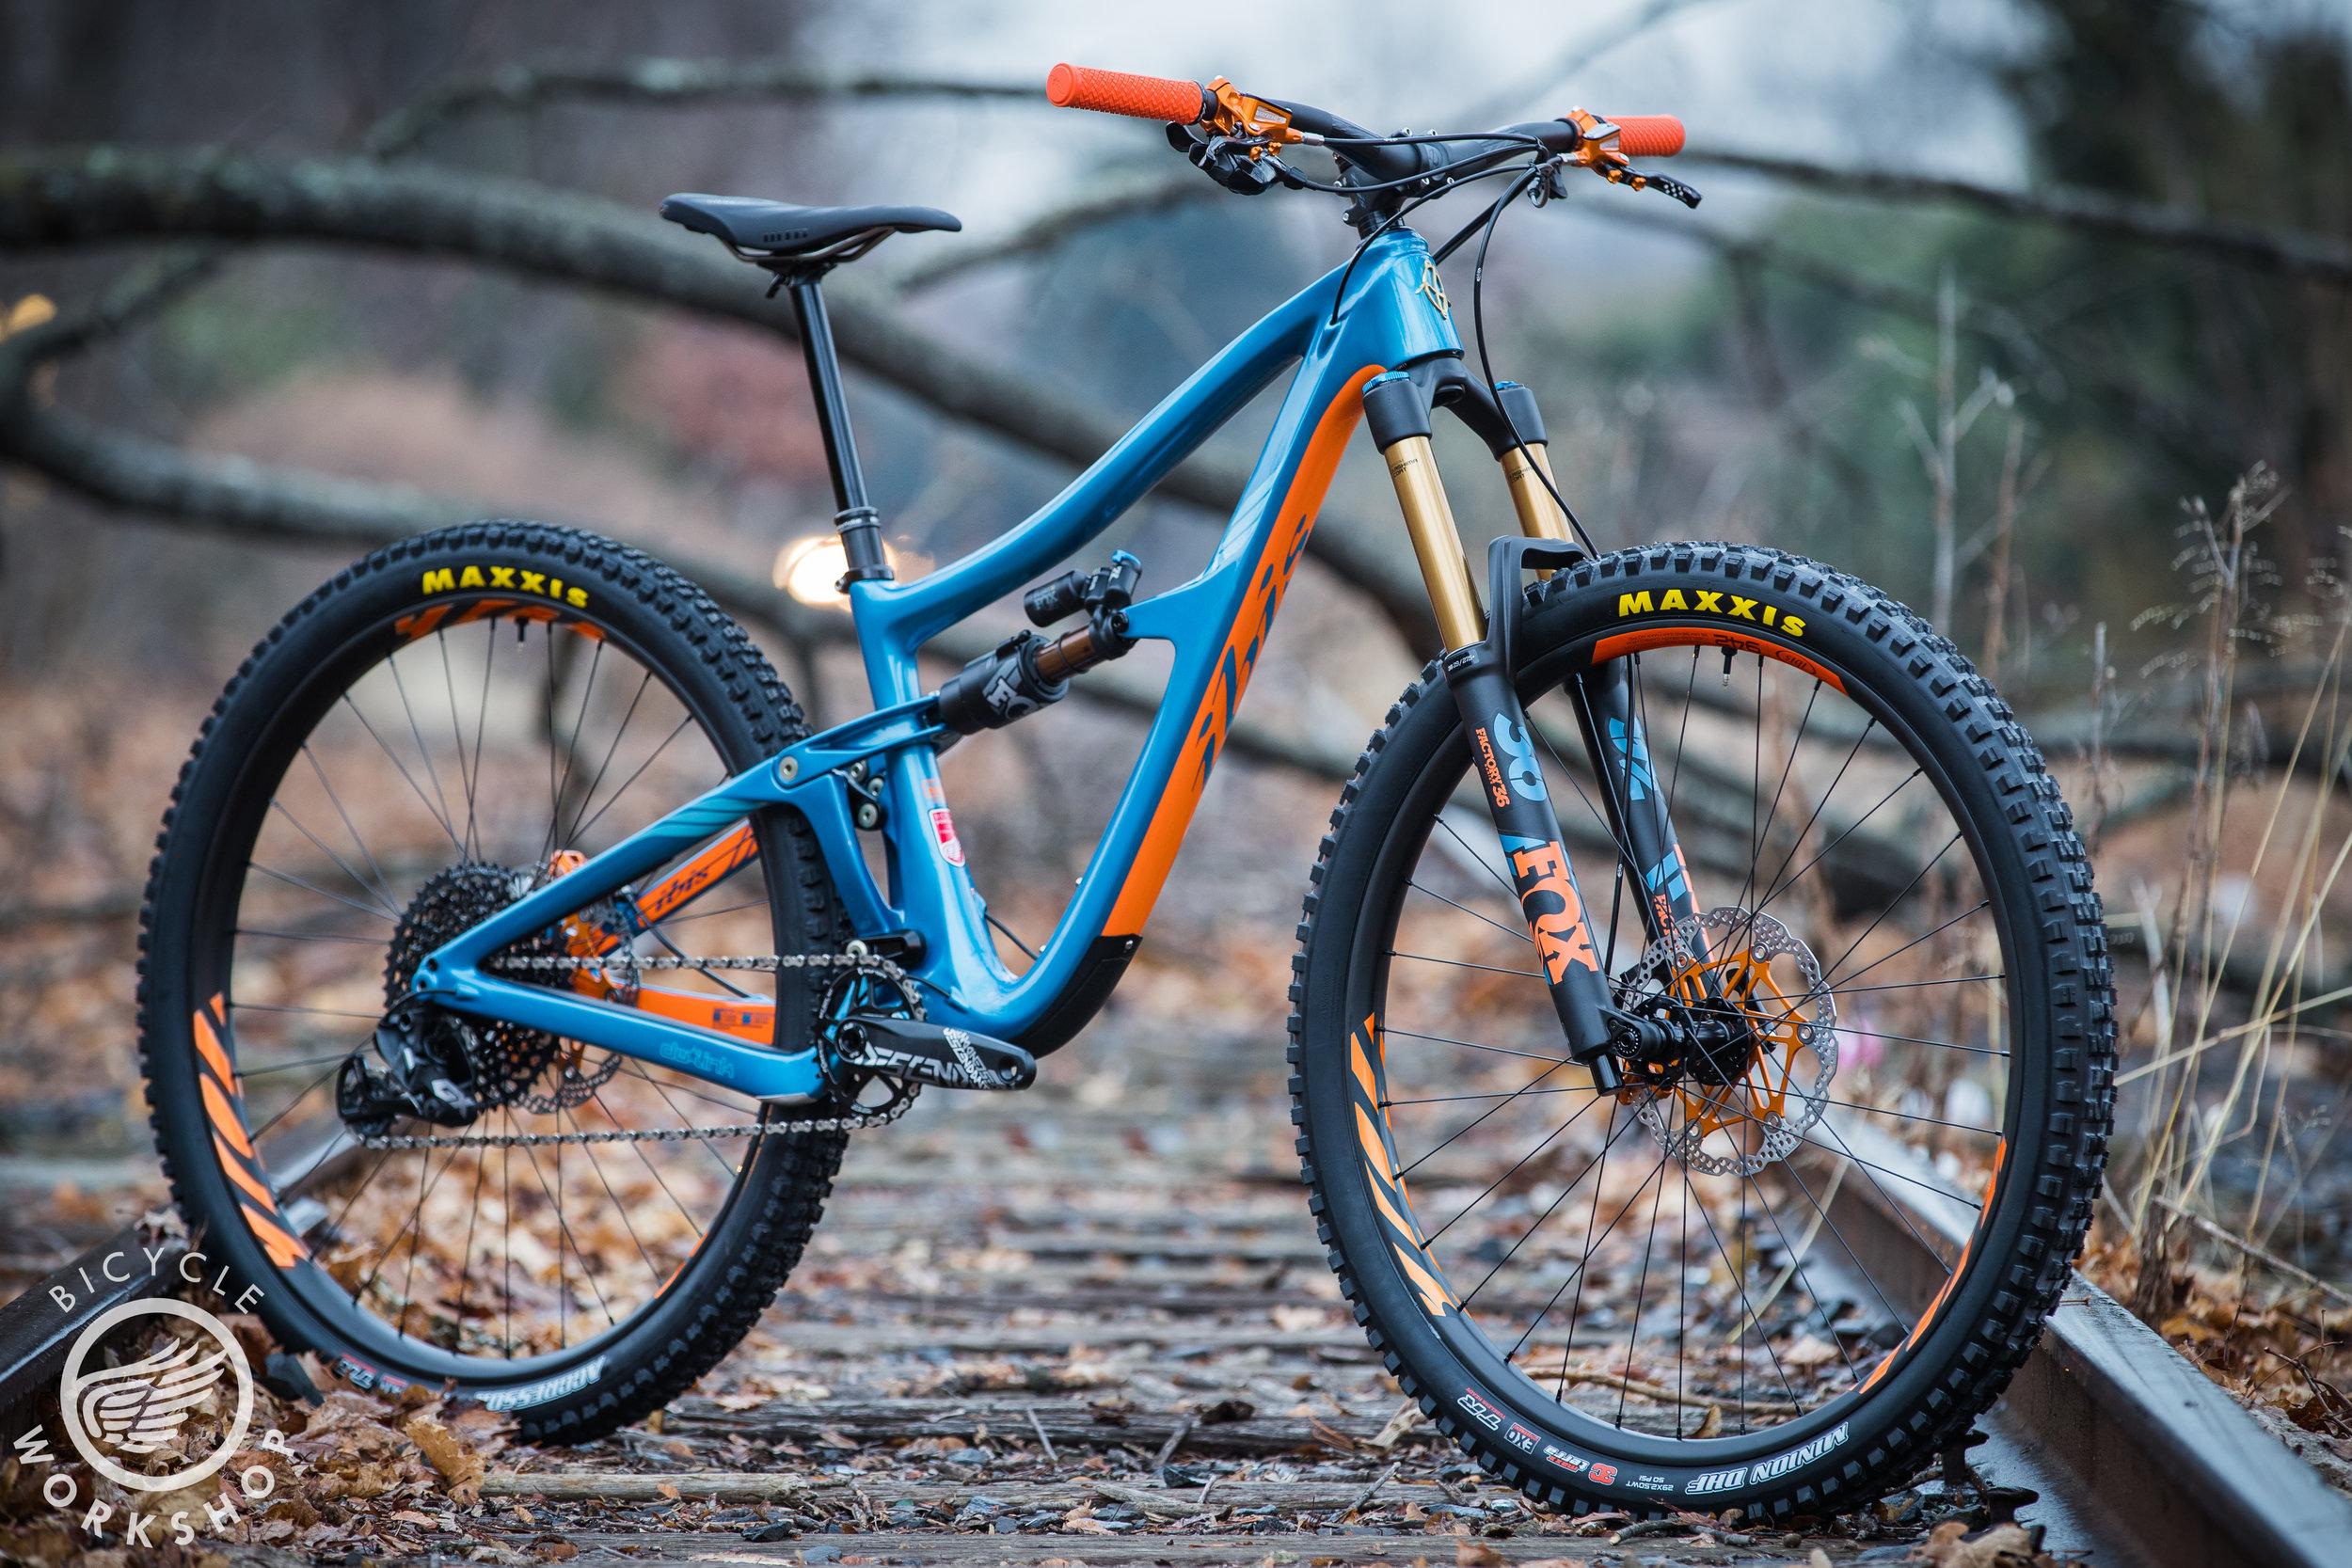 Ibis Cycles RipMo - Custom full suspension mountain bike